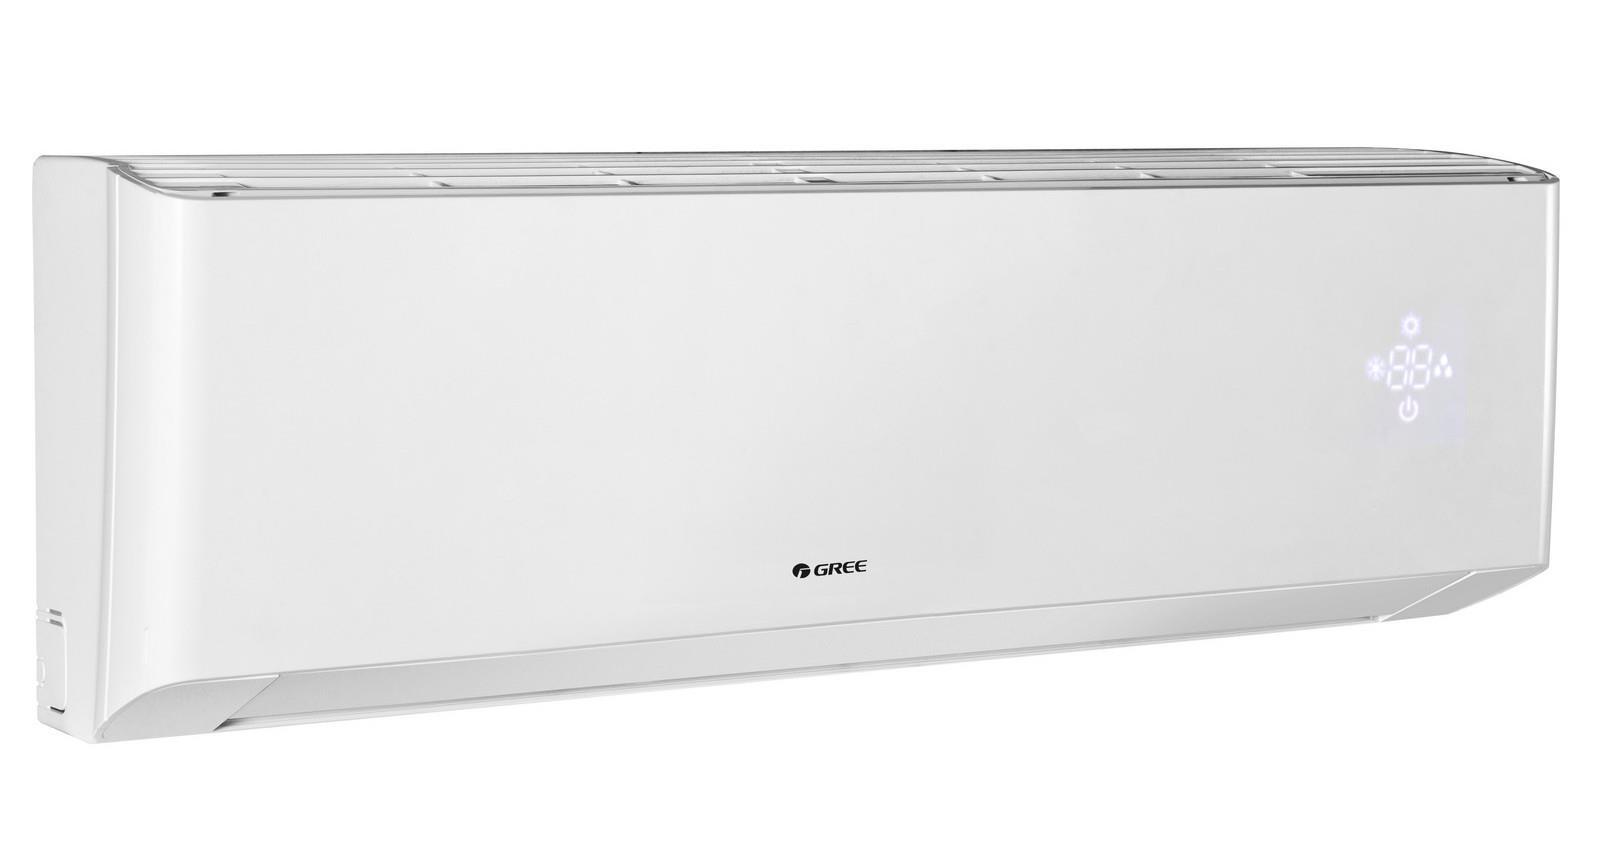 Gree GWH18YE-S6DBA2A Amber Premium Inverter WiFi klima 18k